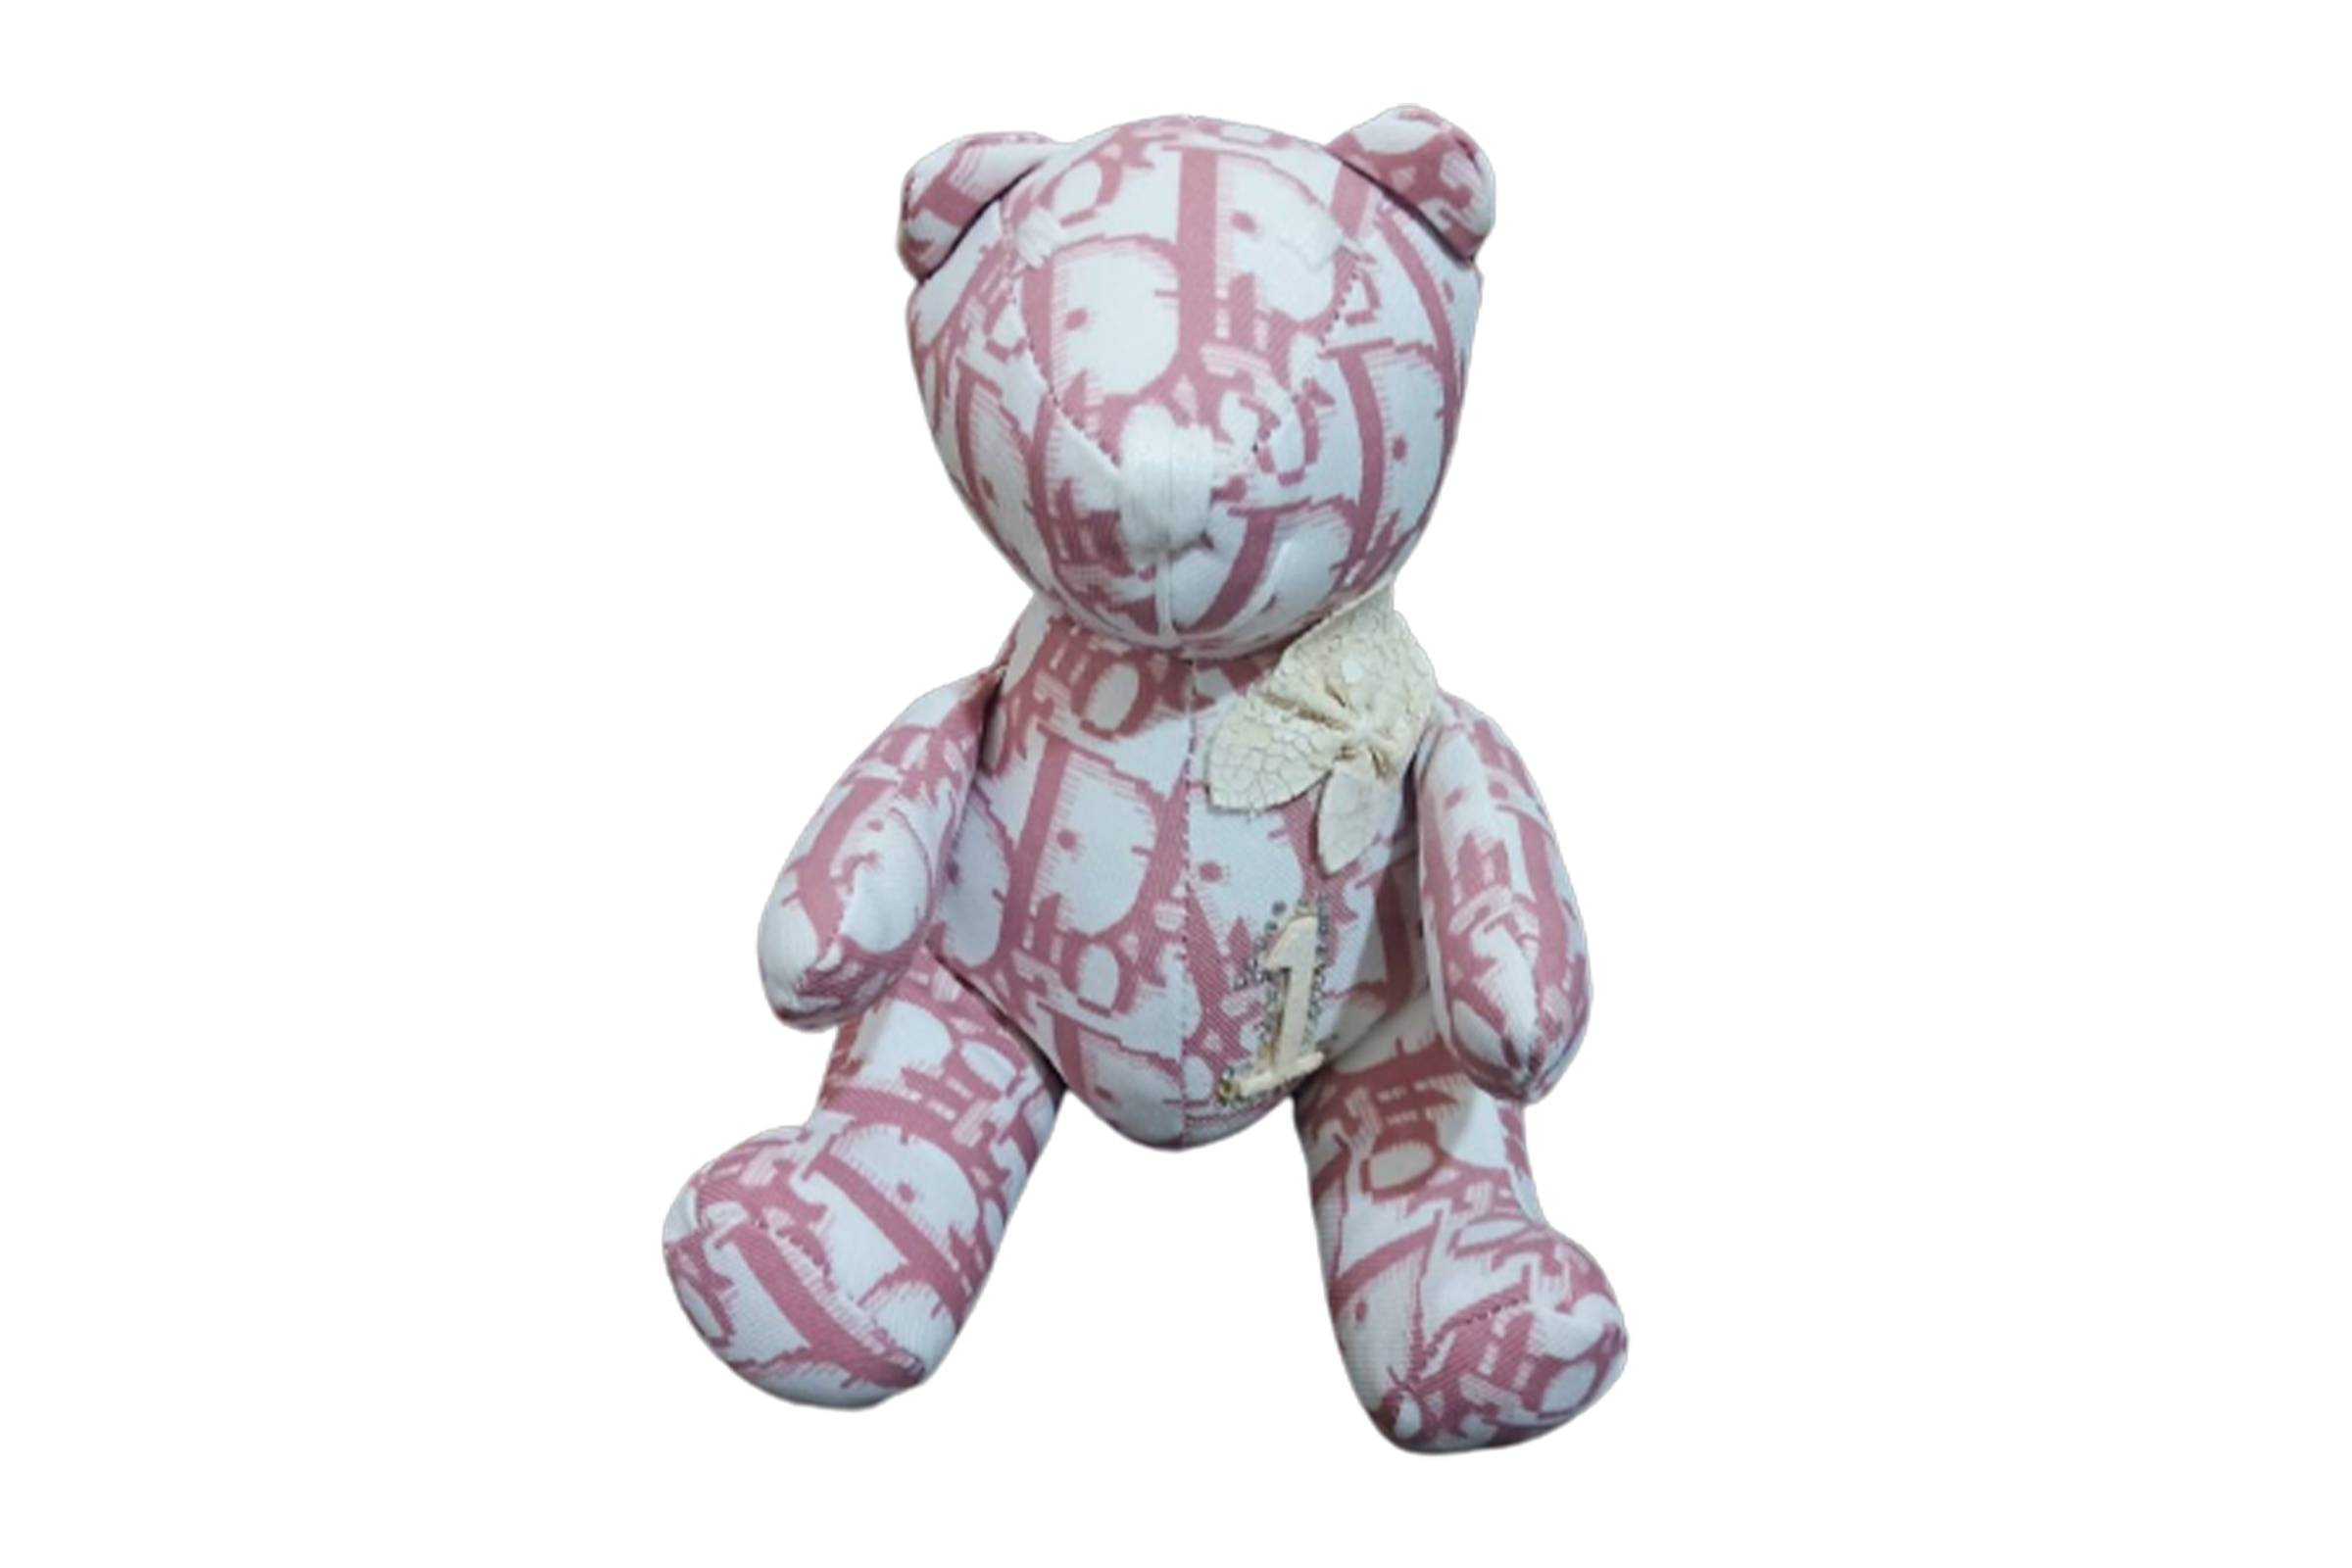 Dior Oblique Print Teddy Bear